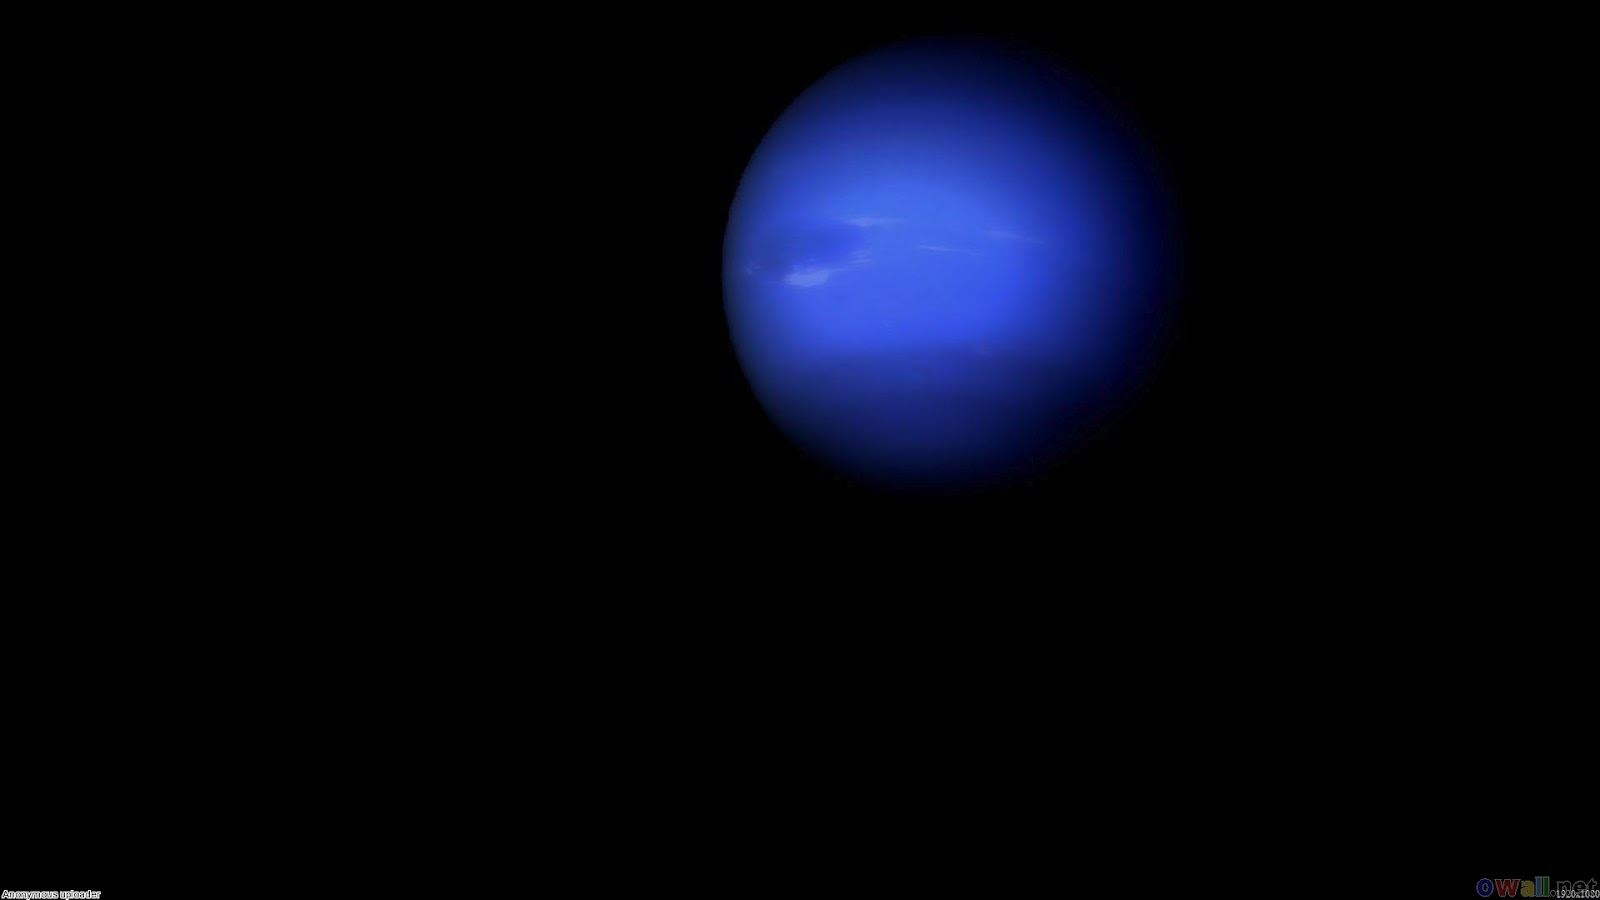 Mercury Hd Wallpaper Planet Neptune Wallpaper Pics About Space